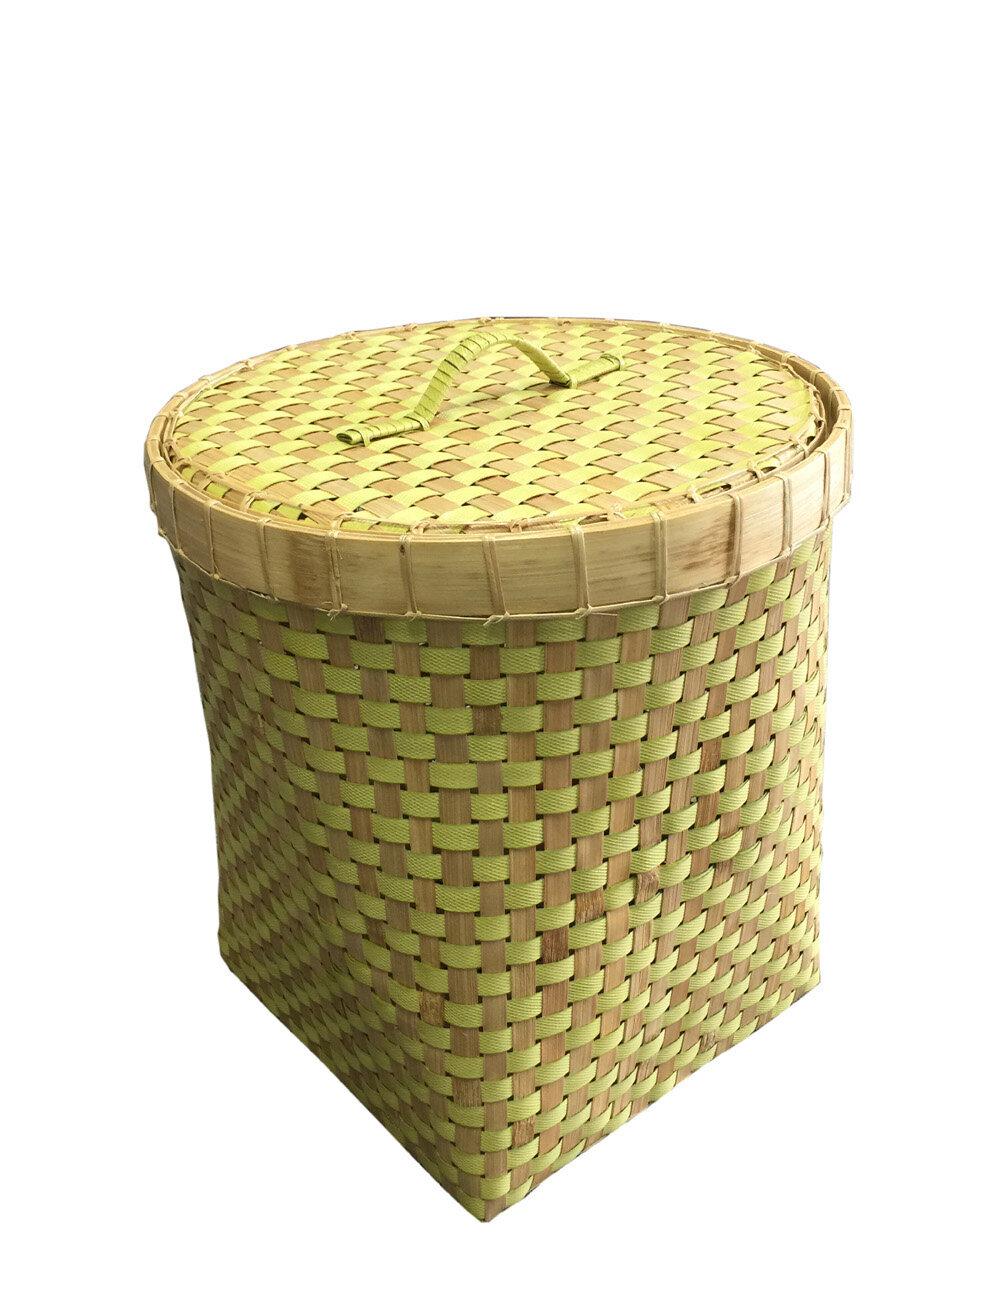 D-Art Collection Wicker Basket with Lid | Wayfair